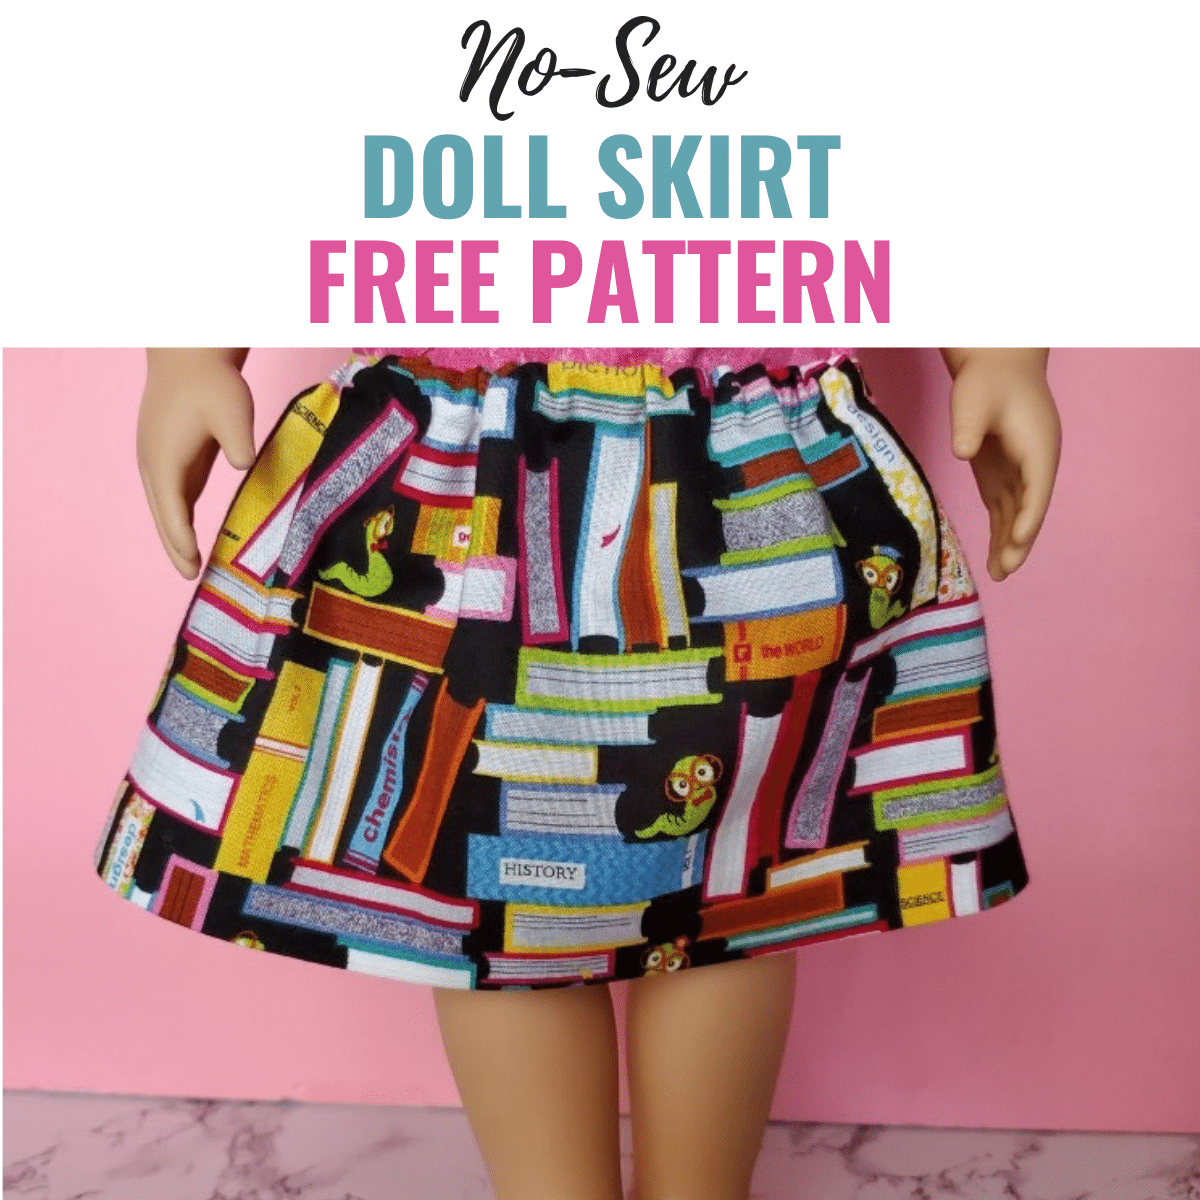 Free No-Sew Doll Skirt Pattern & Tutorial